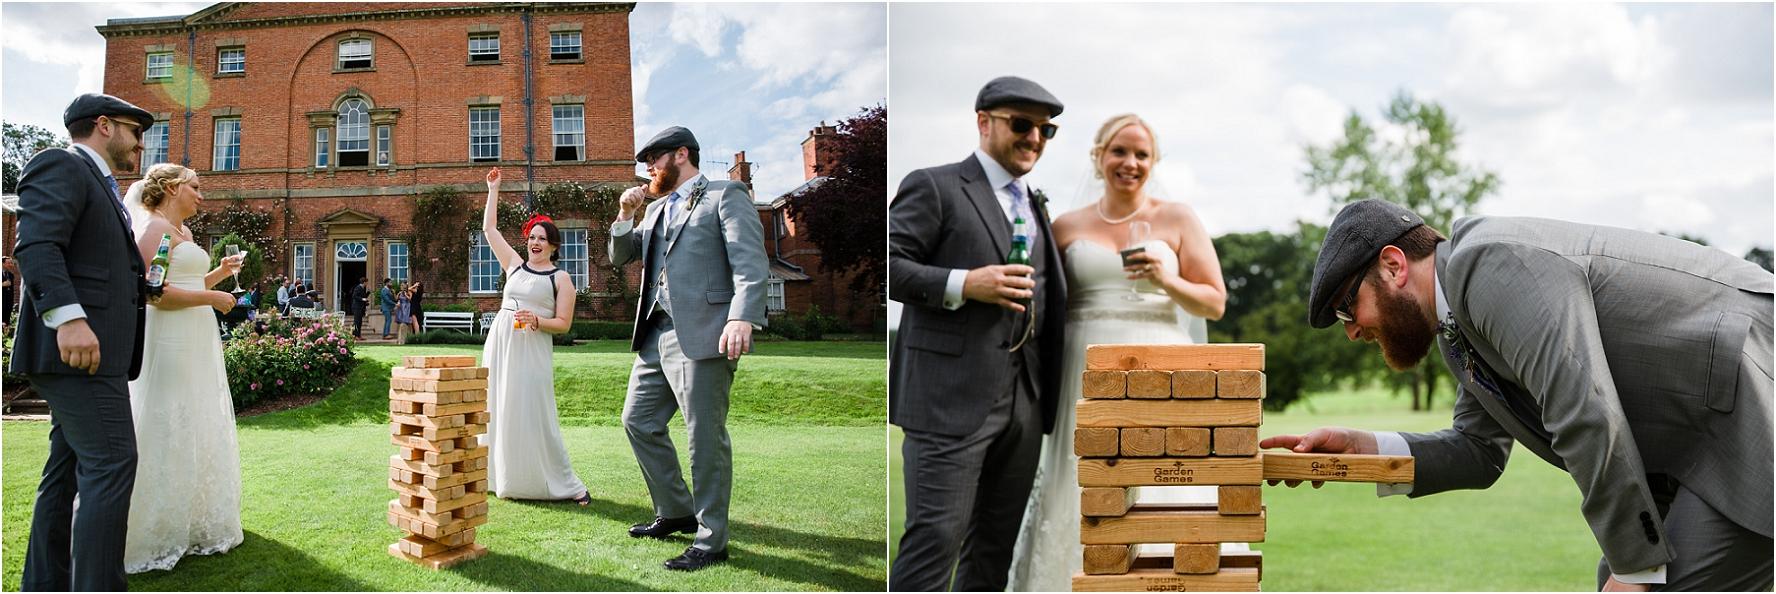 wedding-photography-the-orangery-settringham_0477